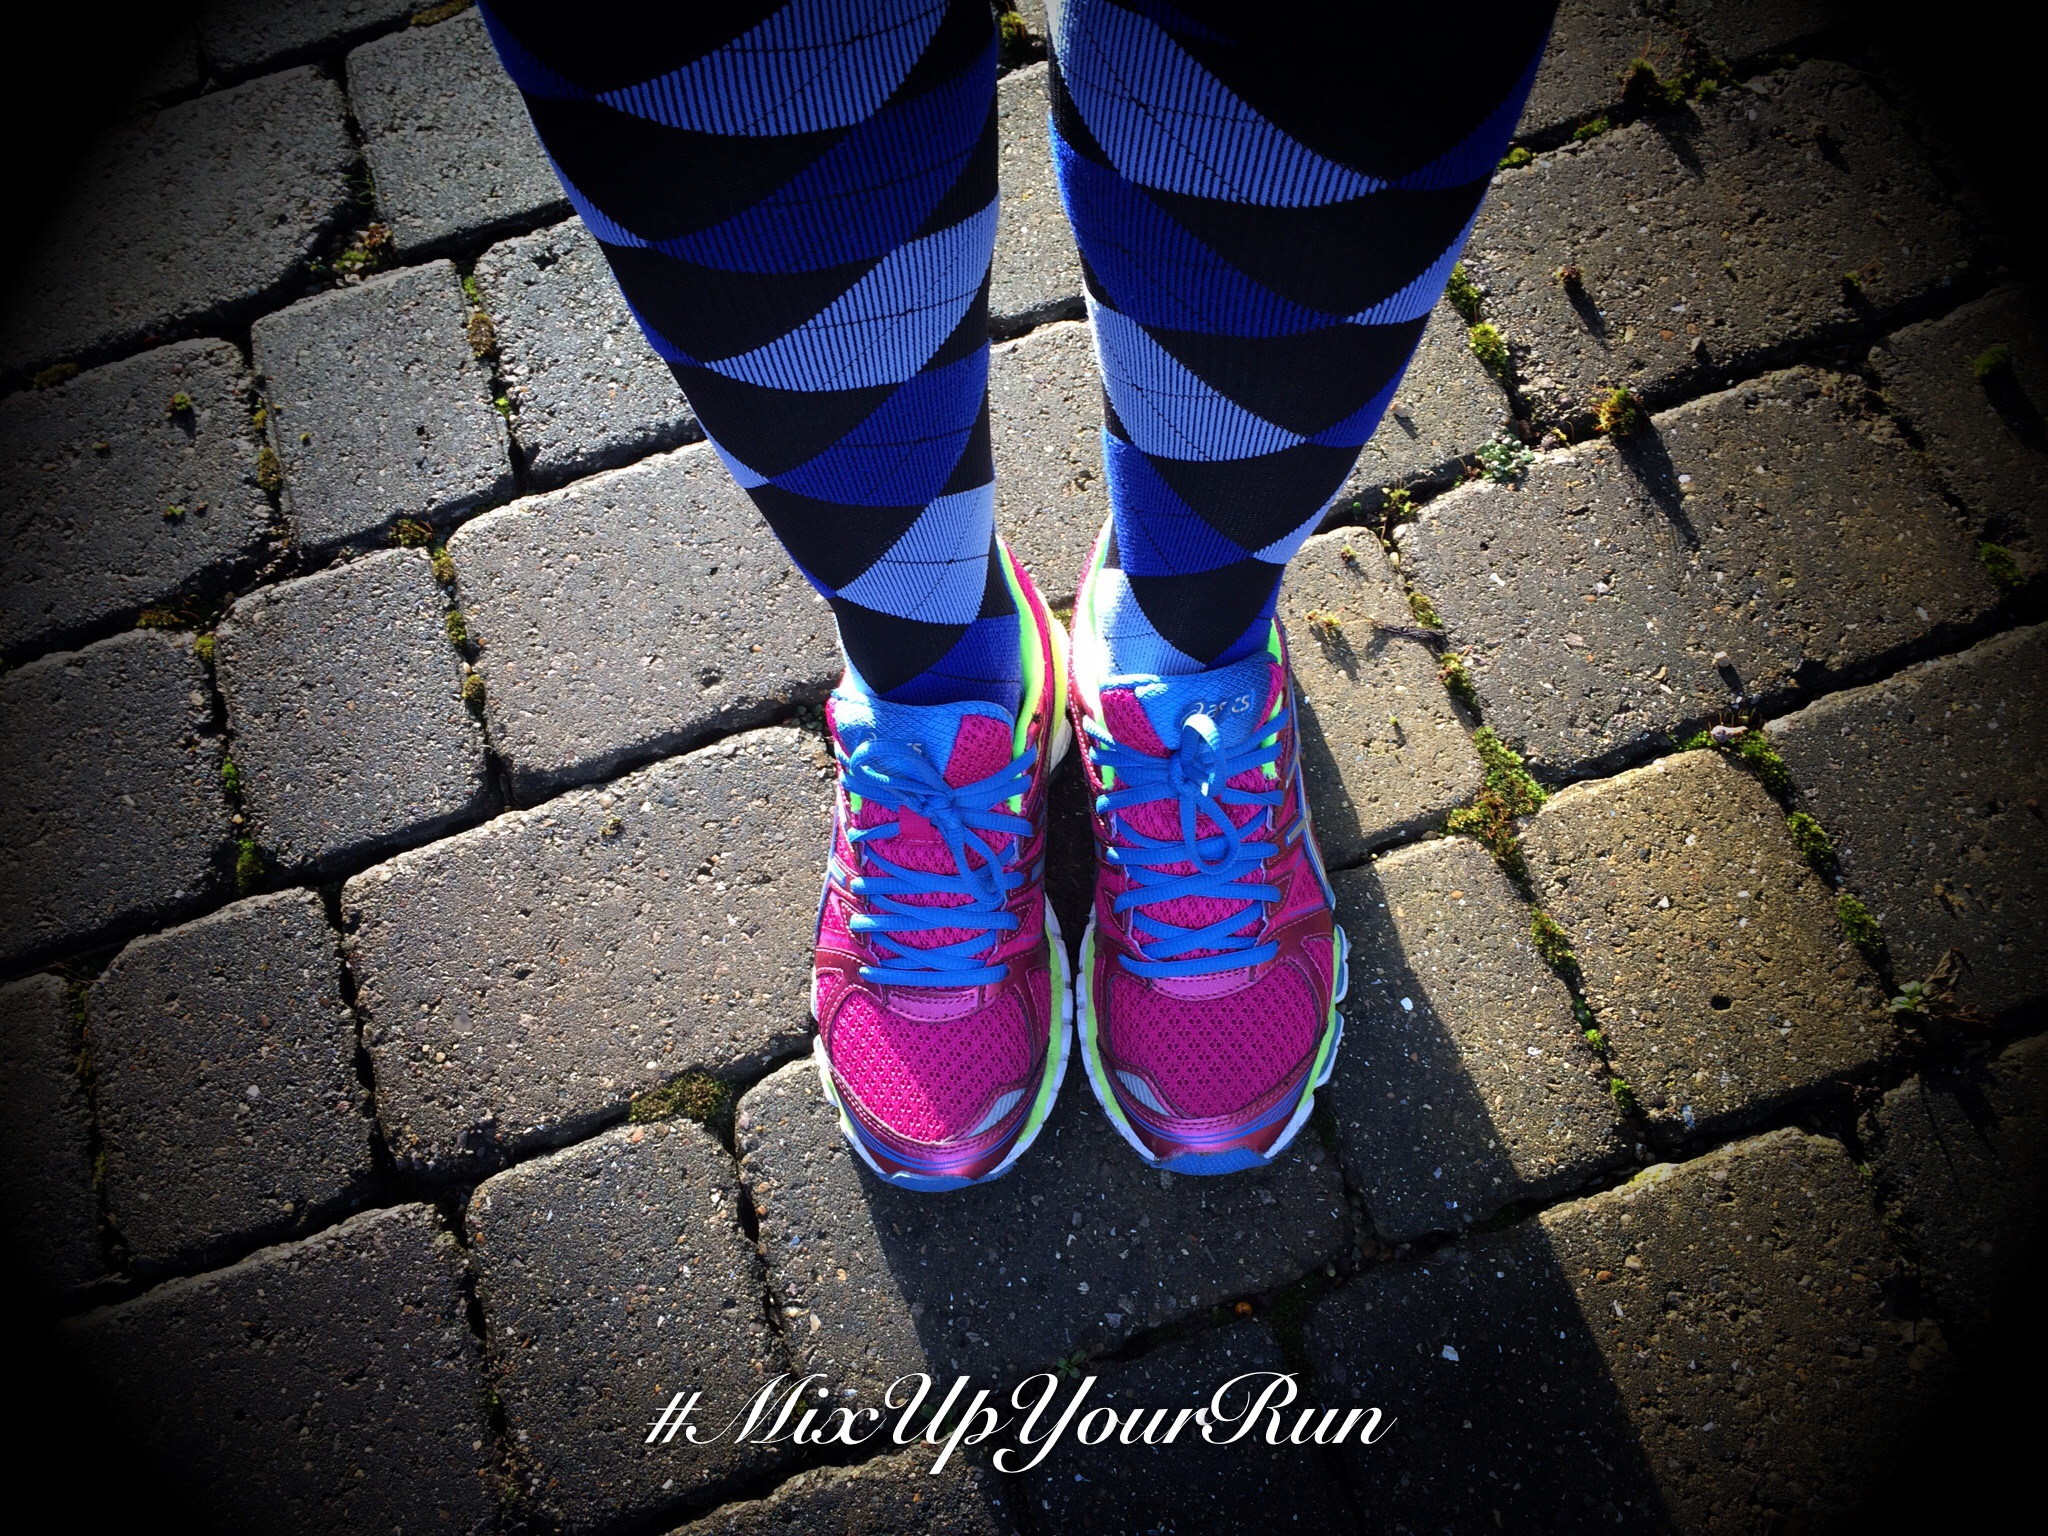 Run long #MixUpYourRun